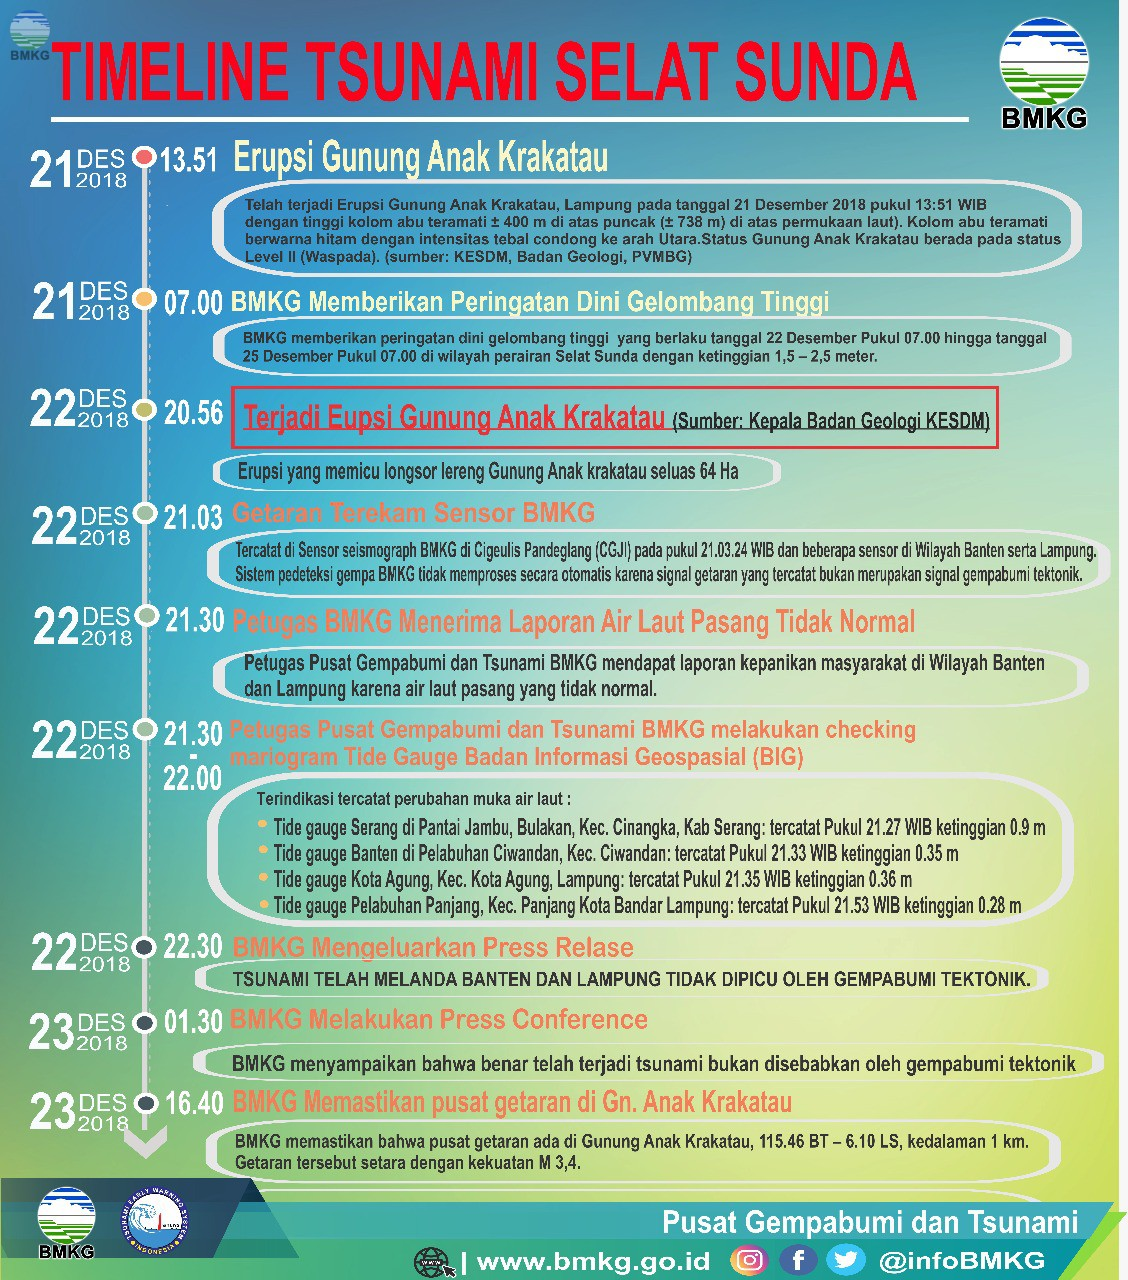 Timeline Tsunami di Selat Sunda